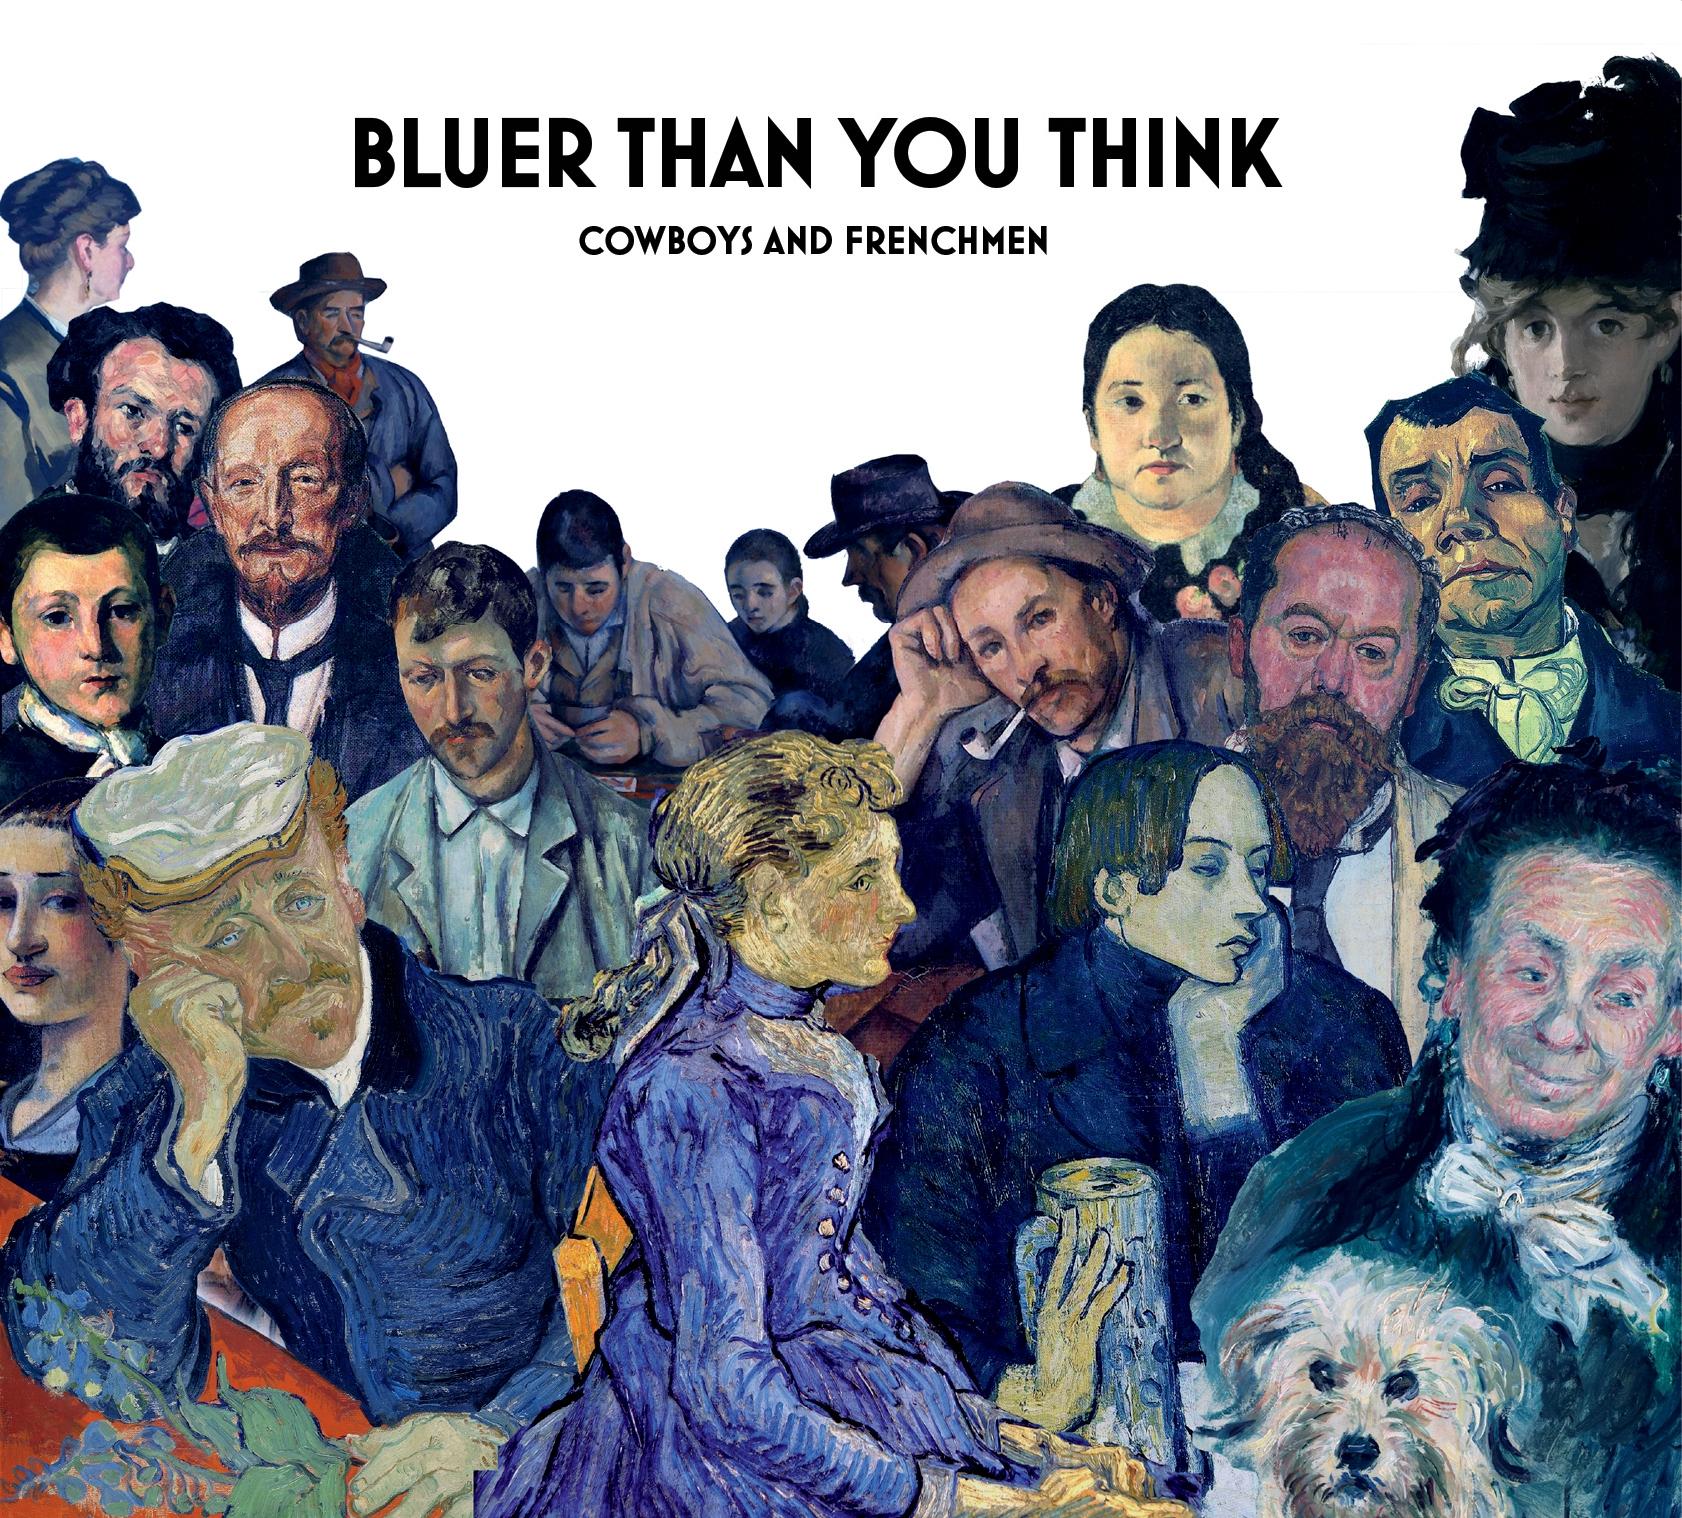 Bluer Than You Think  (2017) Cowboys & Frenchmen   iTunes  |  Amazon